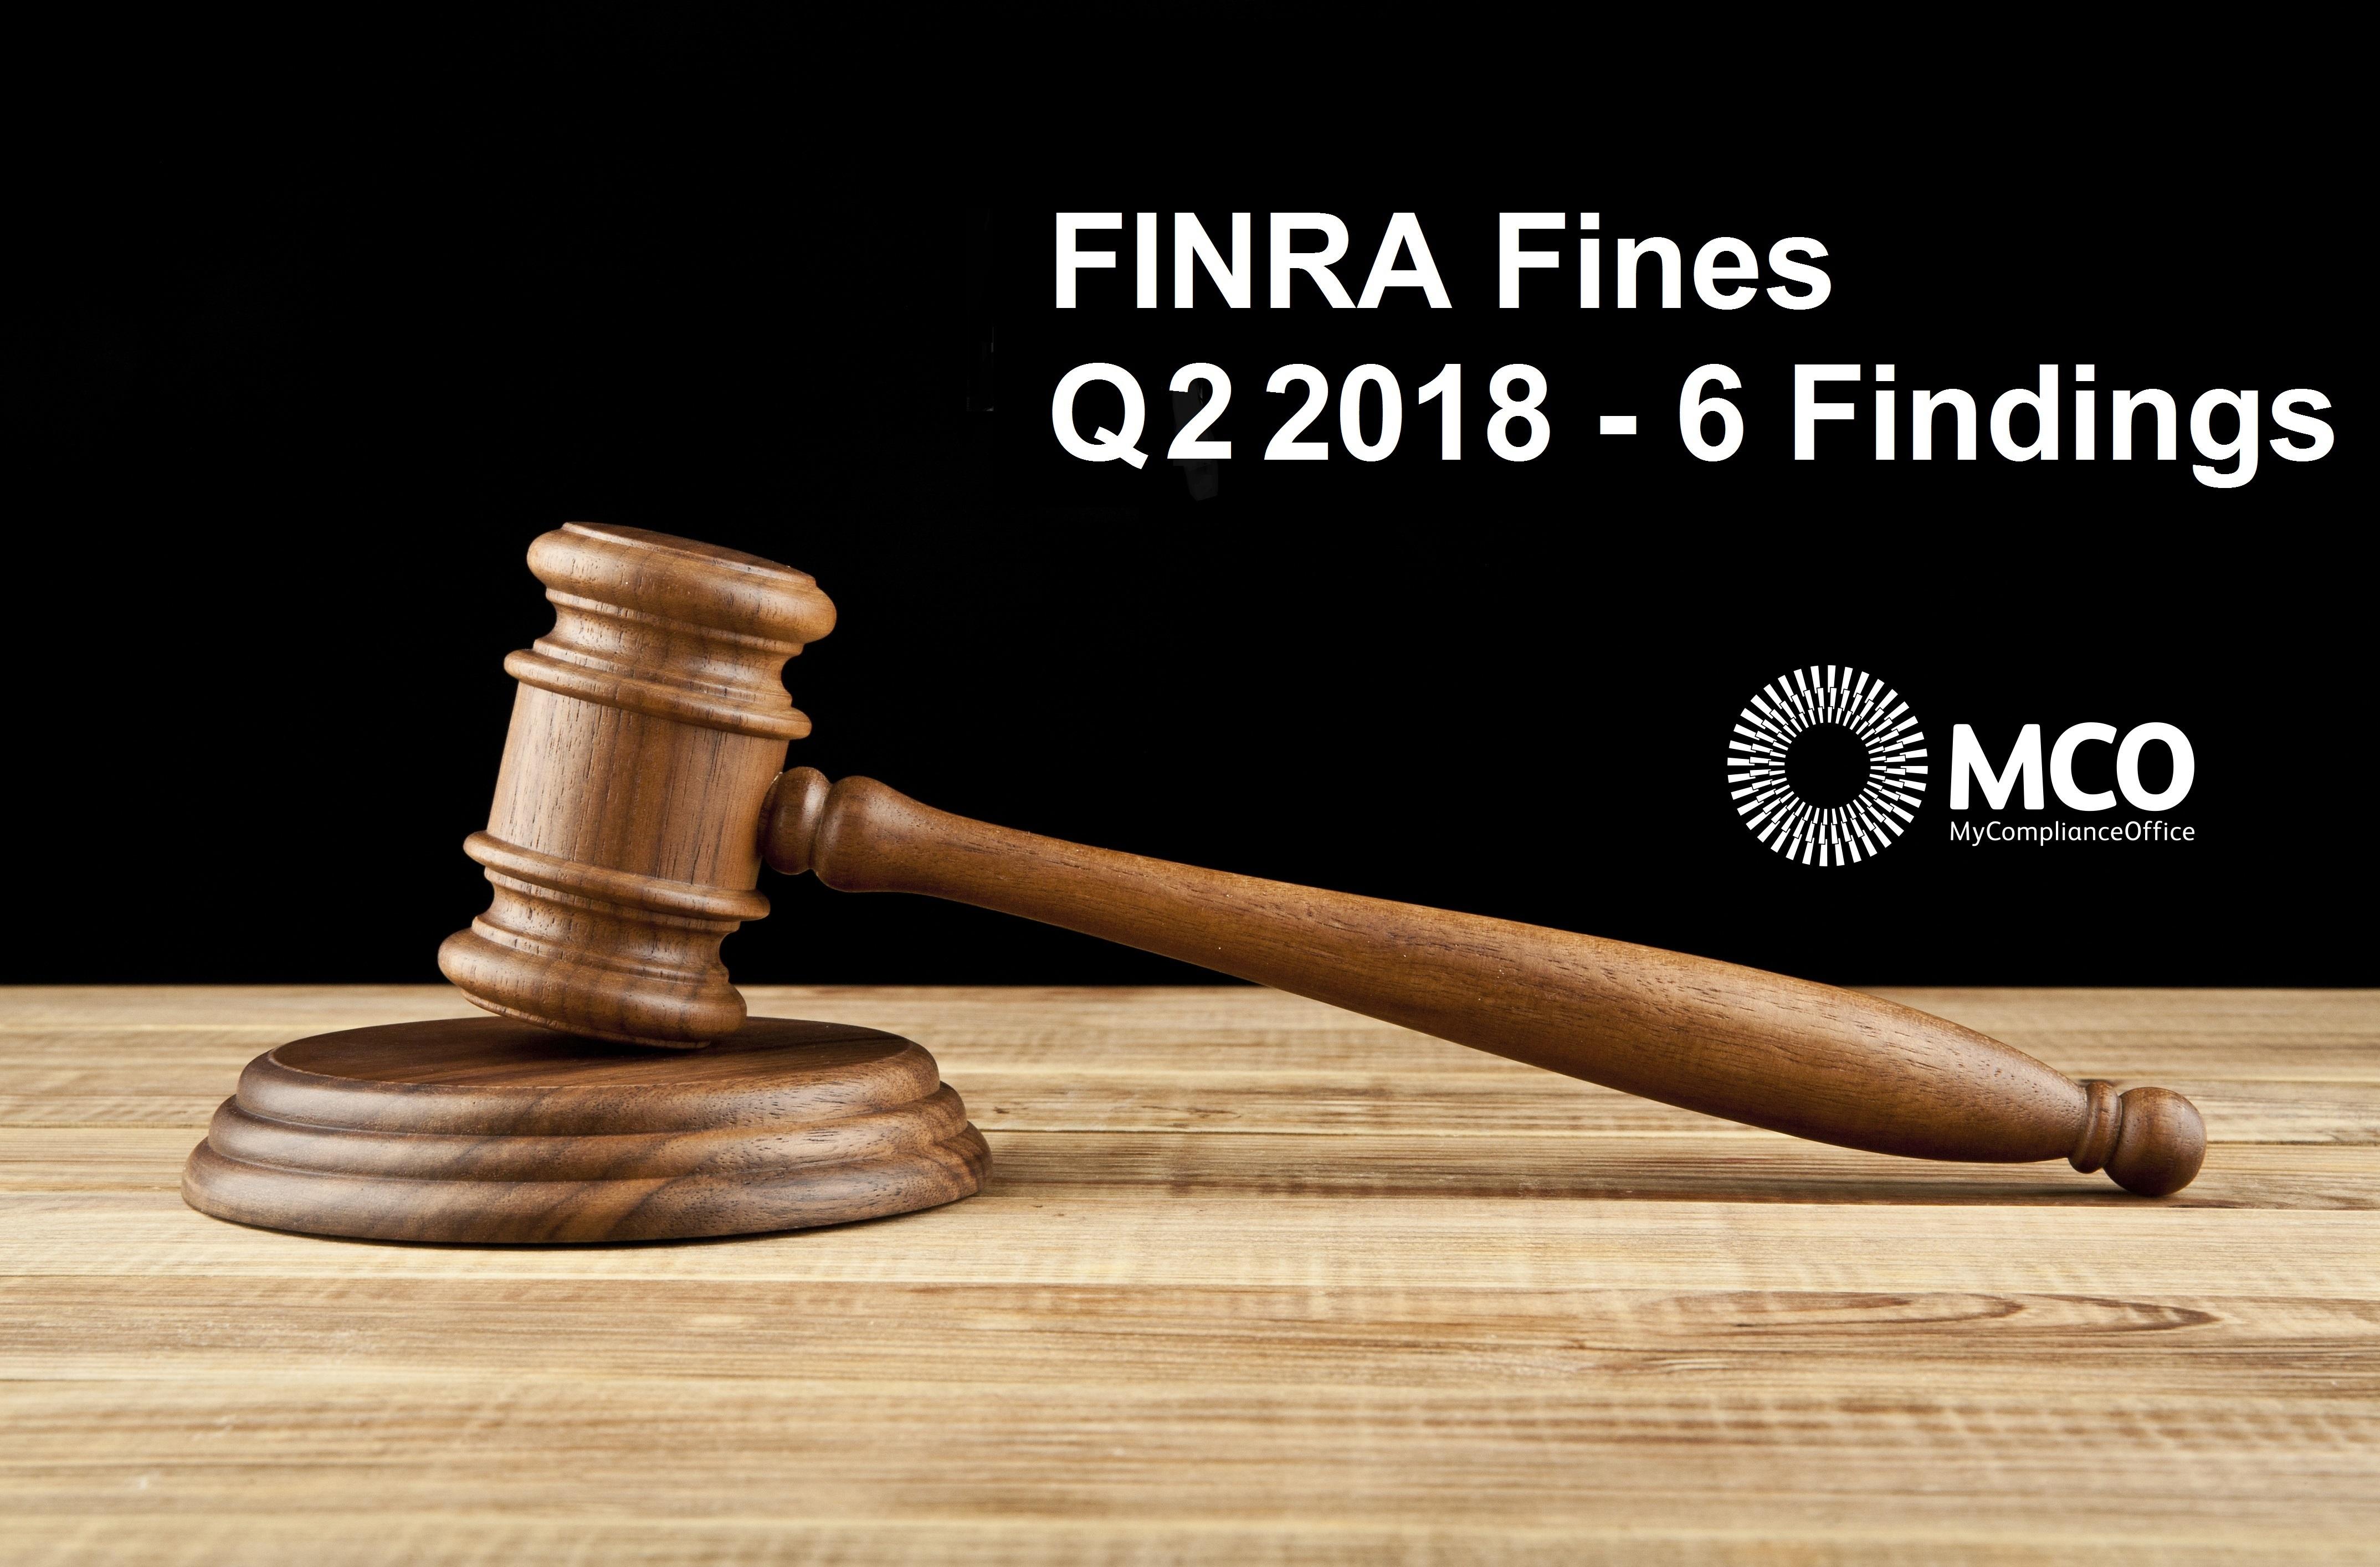 FINRA_Fines_2018 Q2